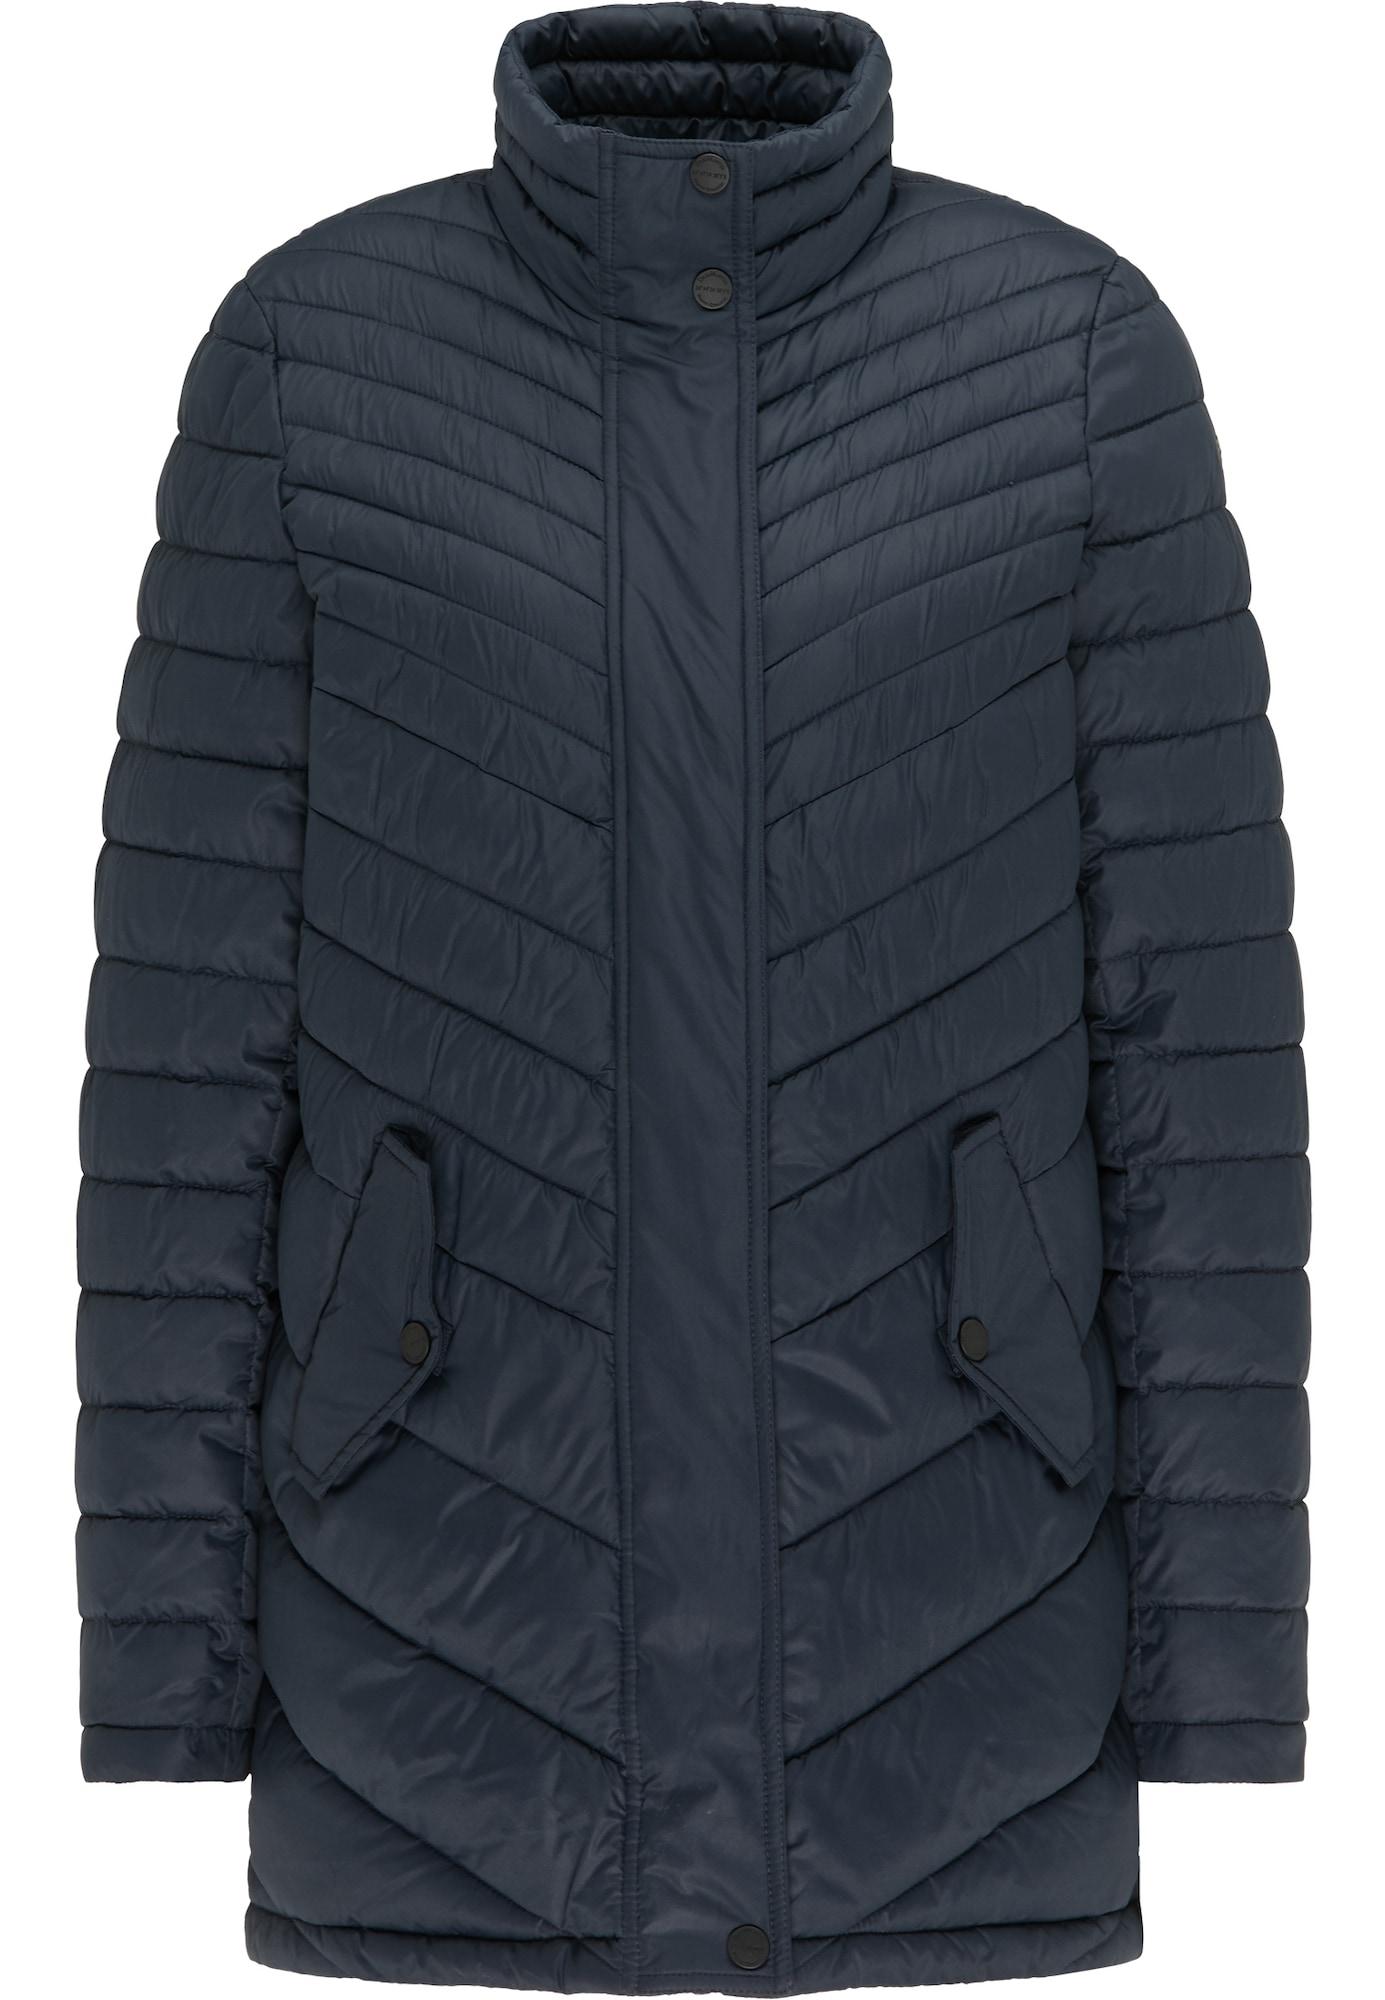 DreiMaster Klassik Žieminis paltas nakties mėlyna